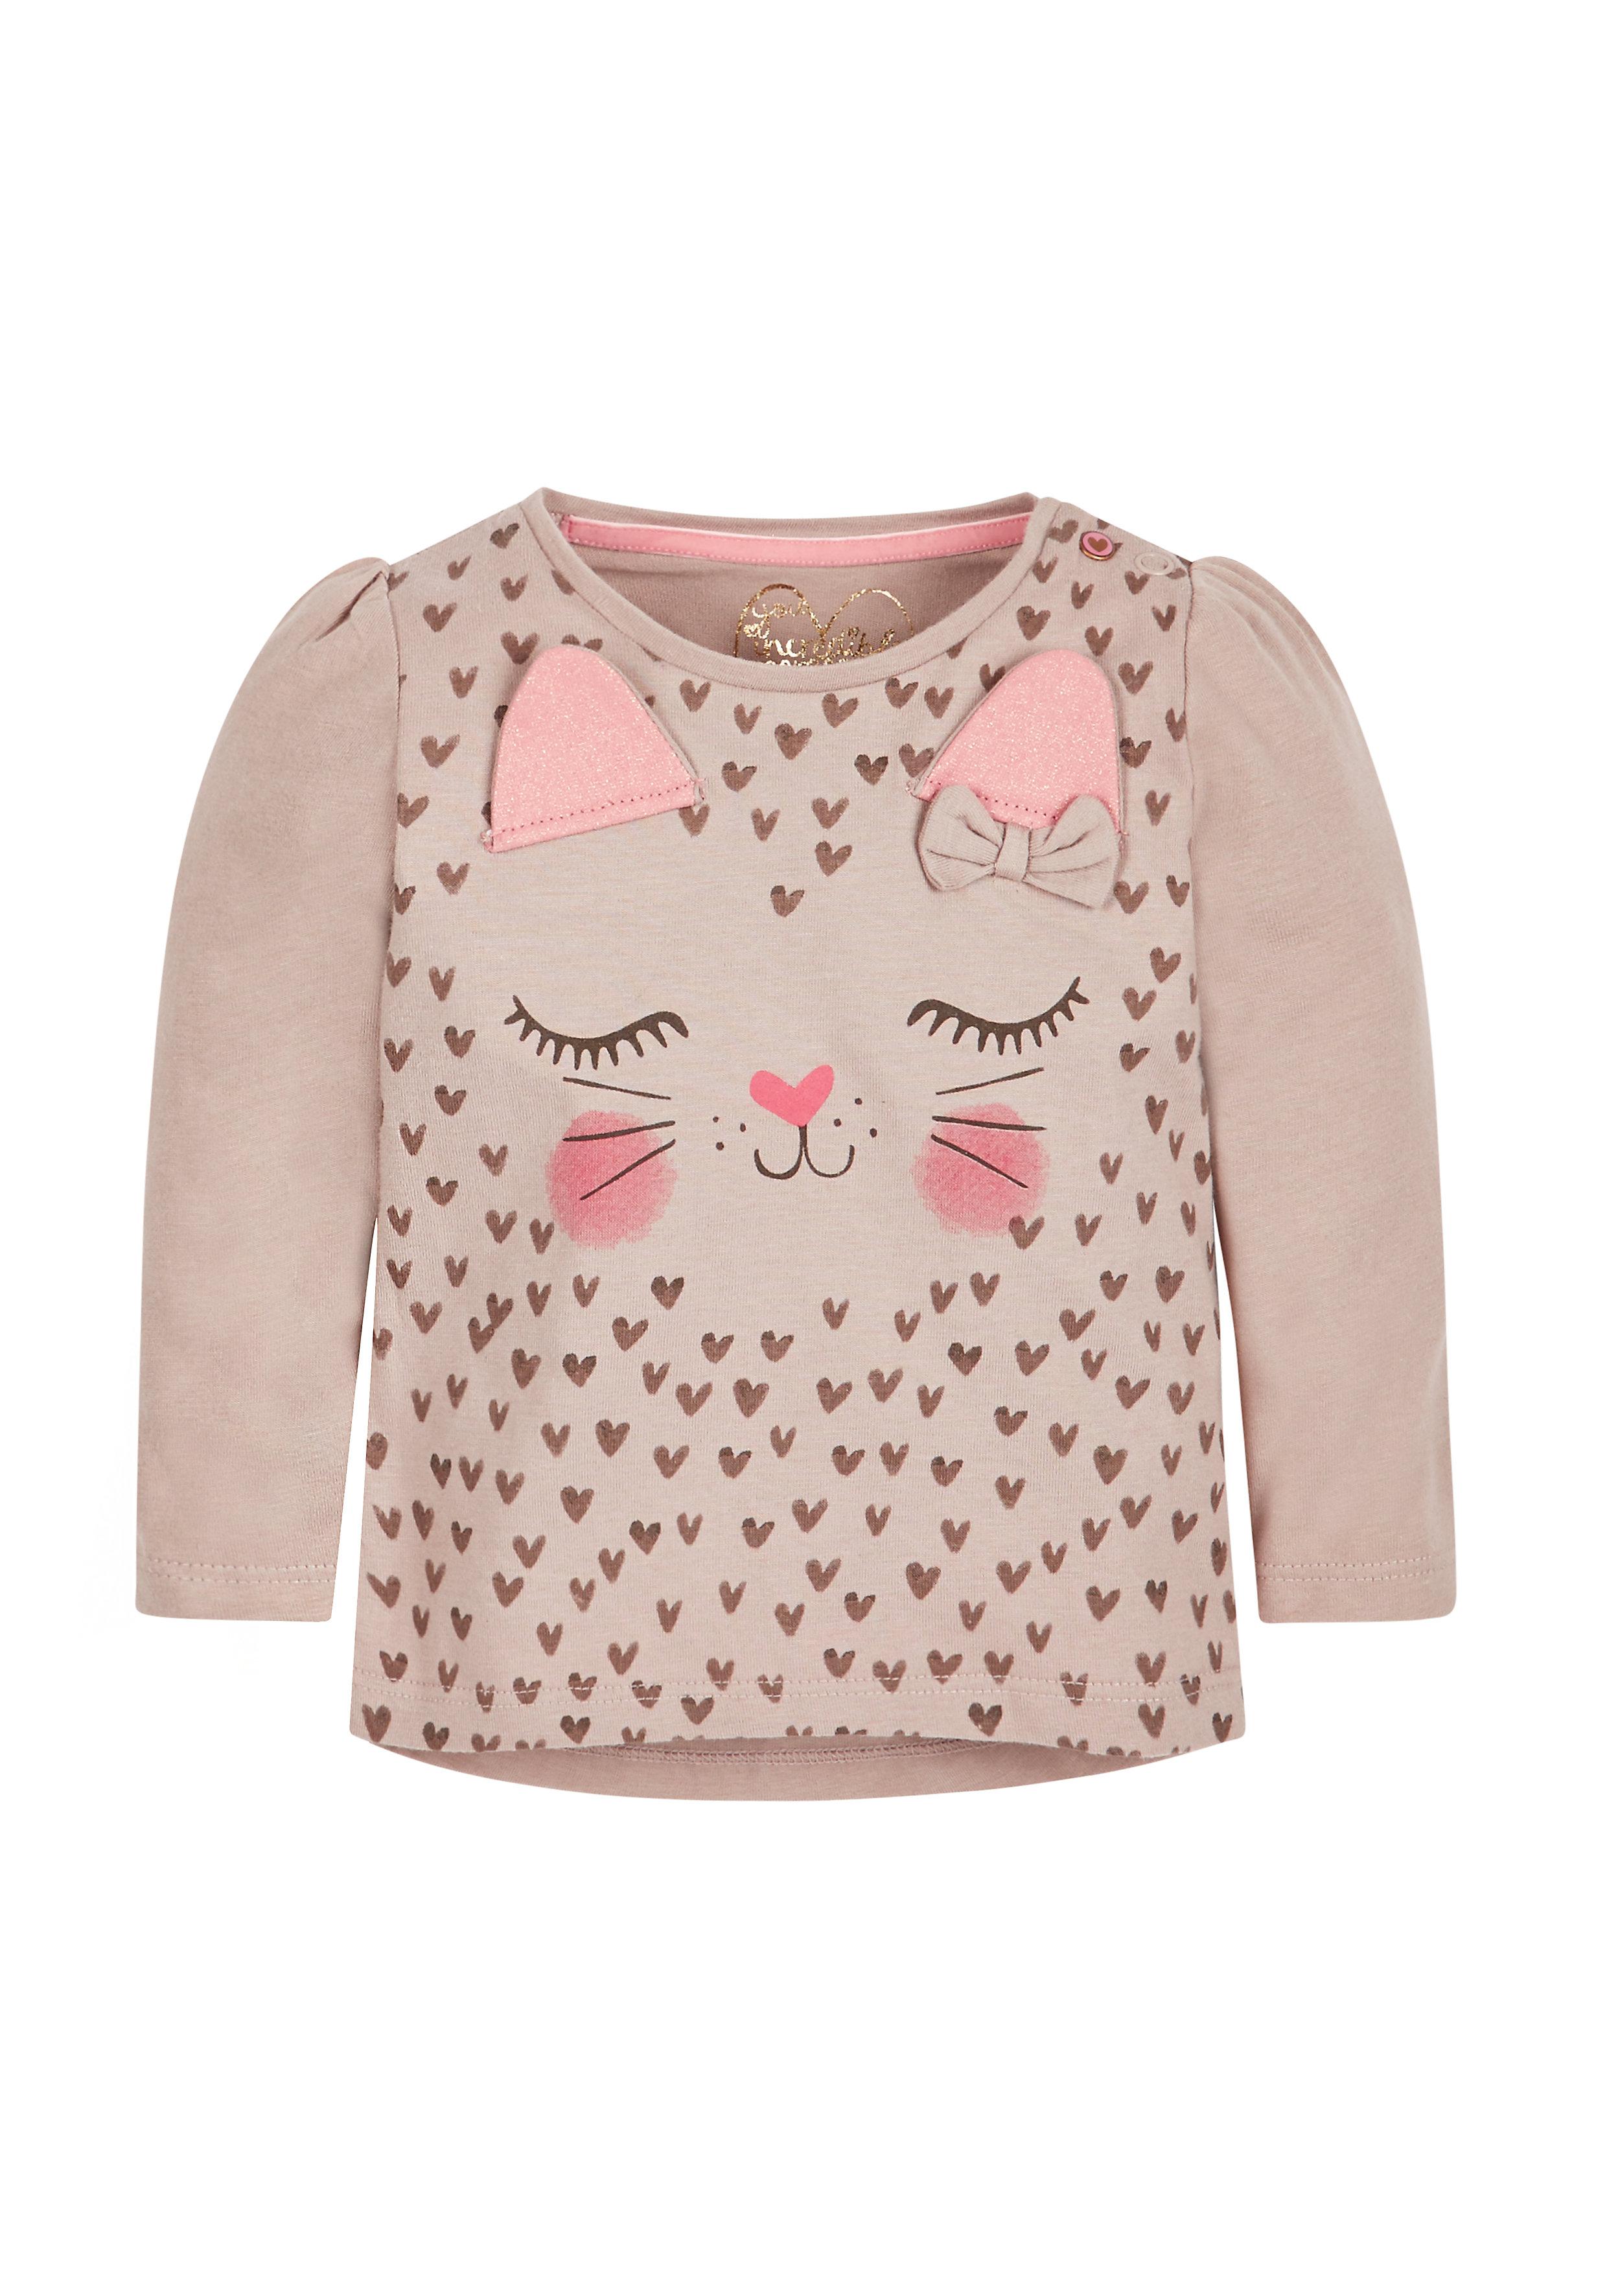 Mothercare | Girls Snow Leopard T-Shirt - Pink